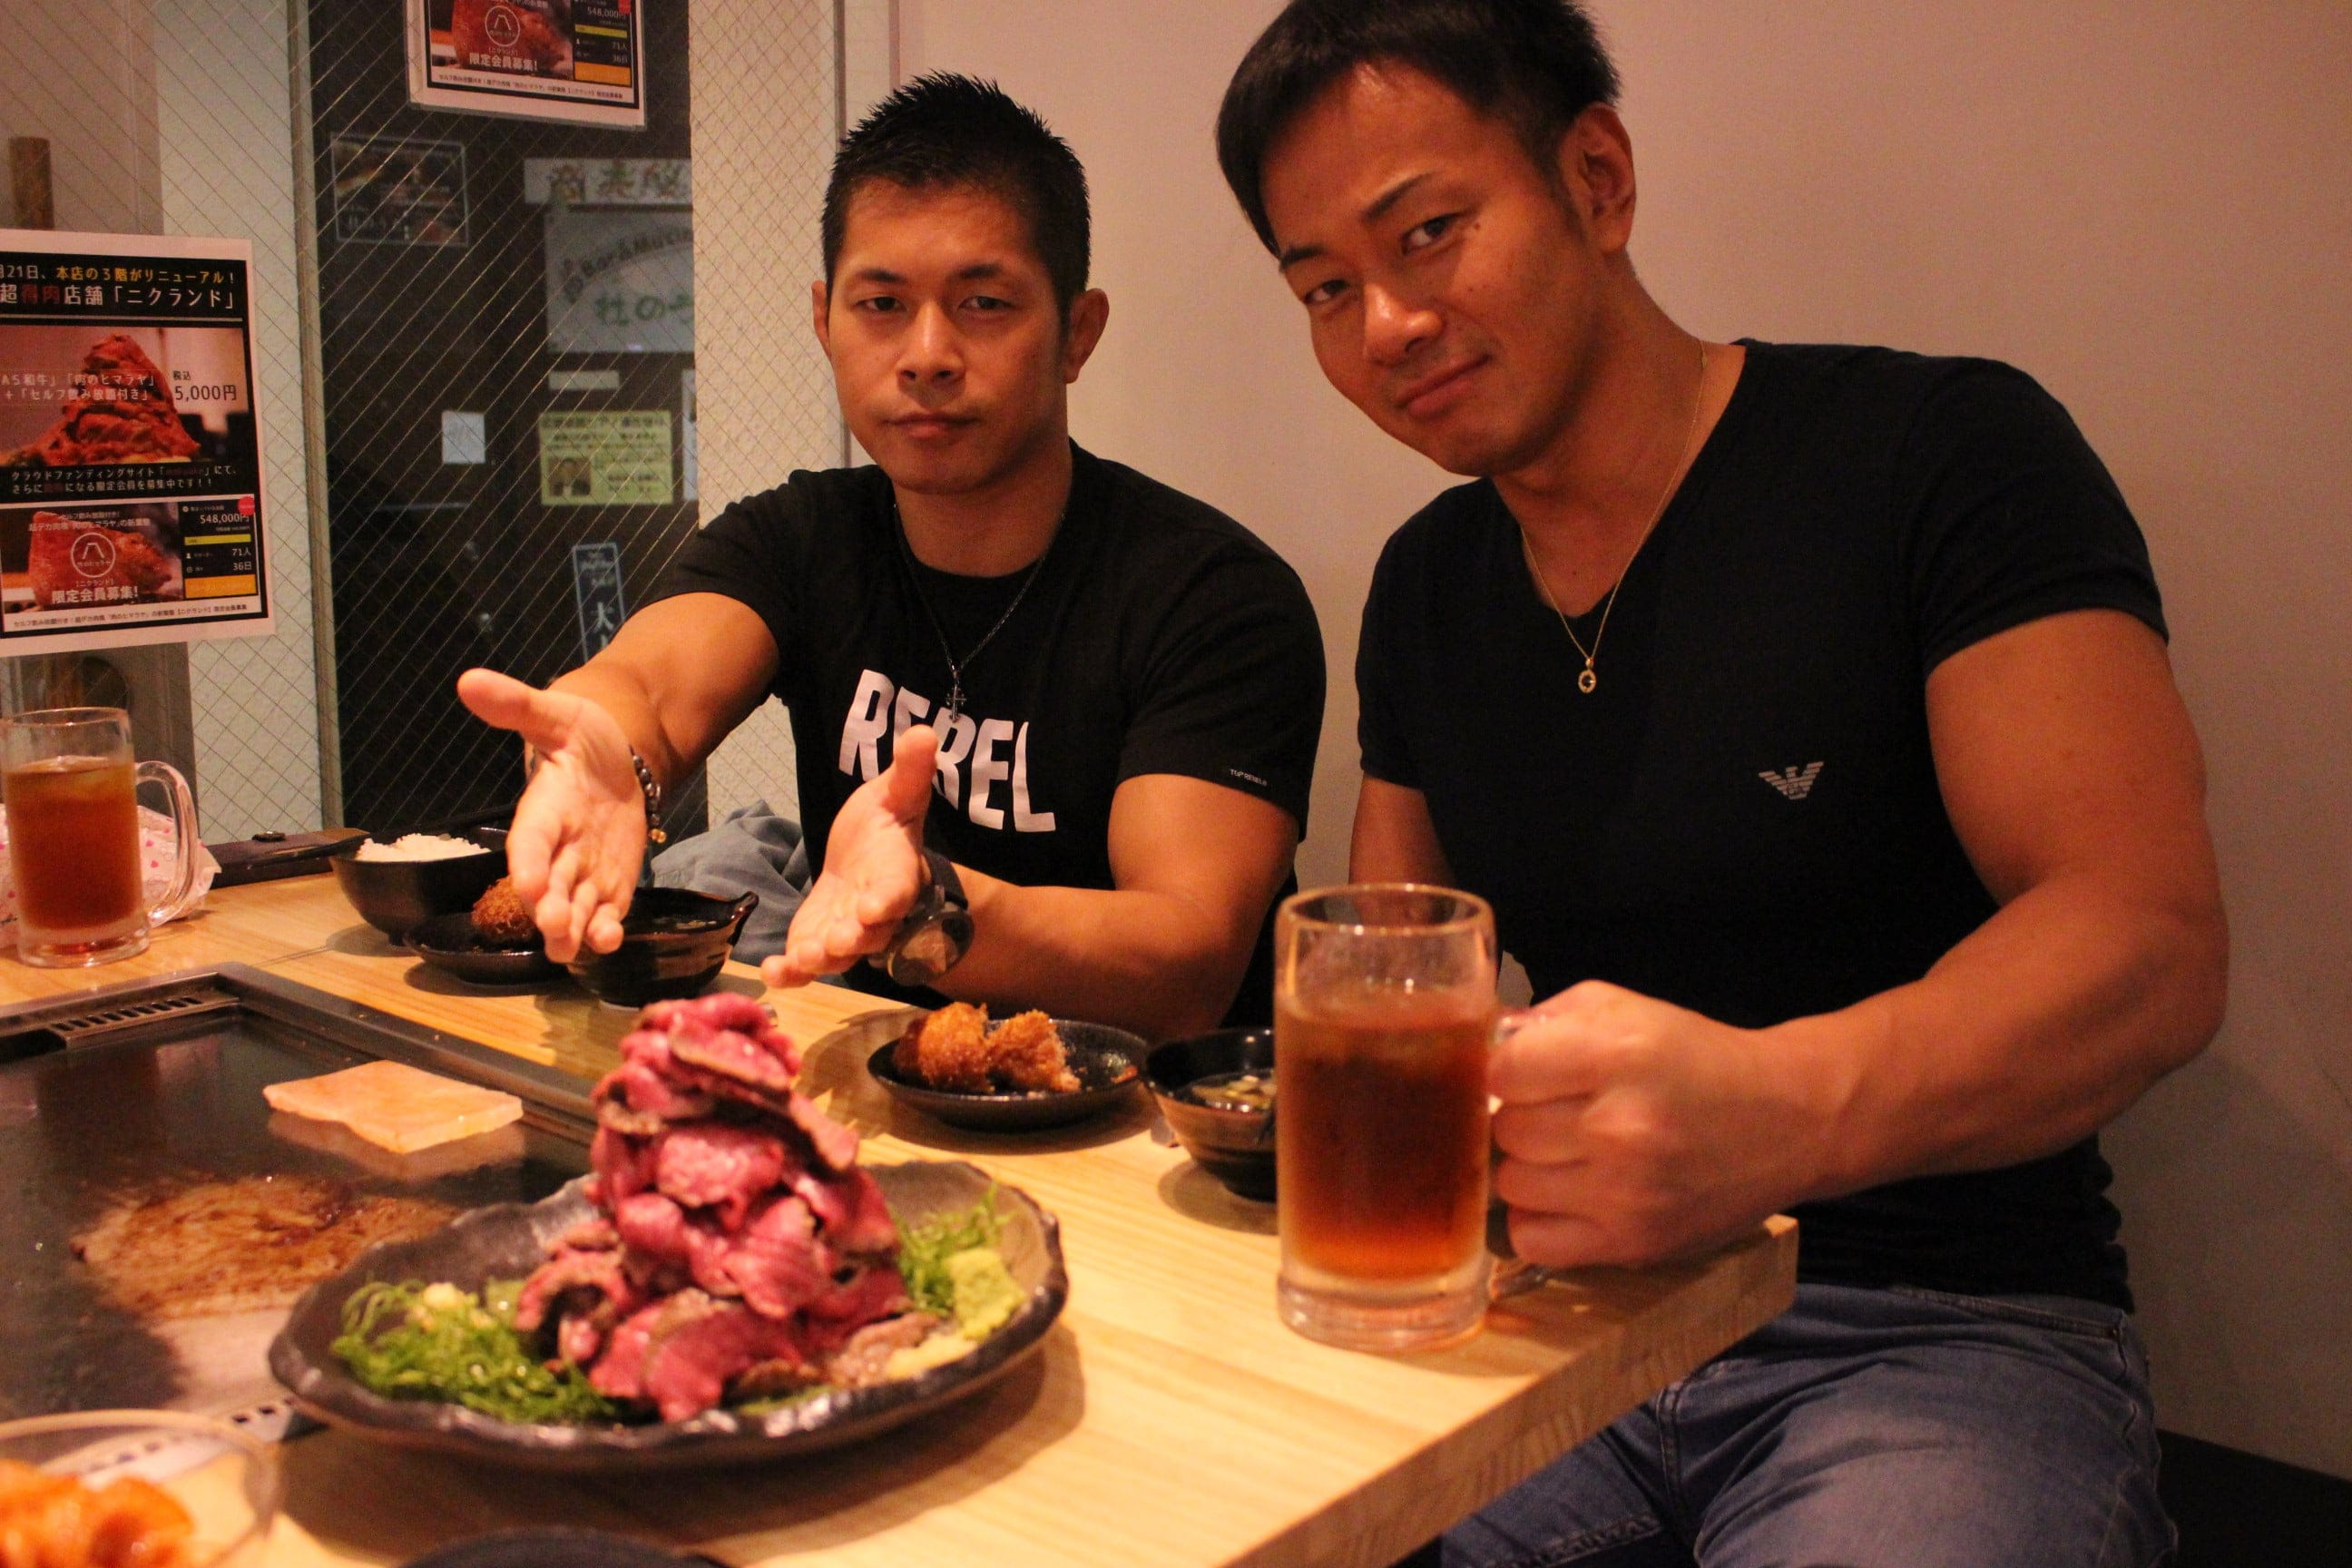 [FC会員様専用]限定20席!ドラゴンゲートディナーイベント・土井吉 in 肉のヒマラヤTEPPAN 赤坂(第一部18時スタート)のイメージその1